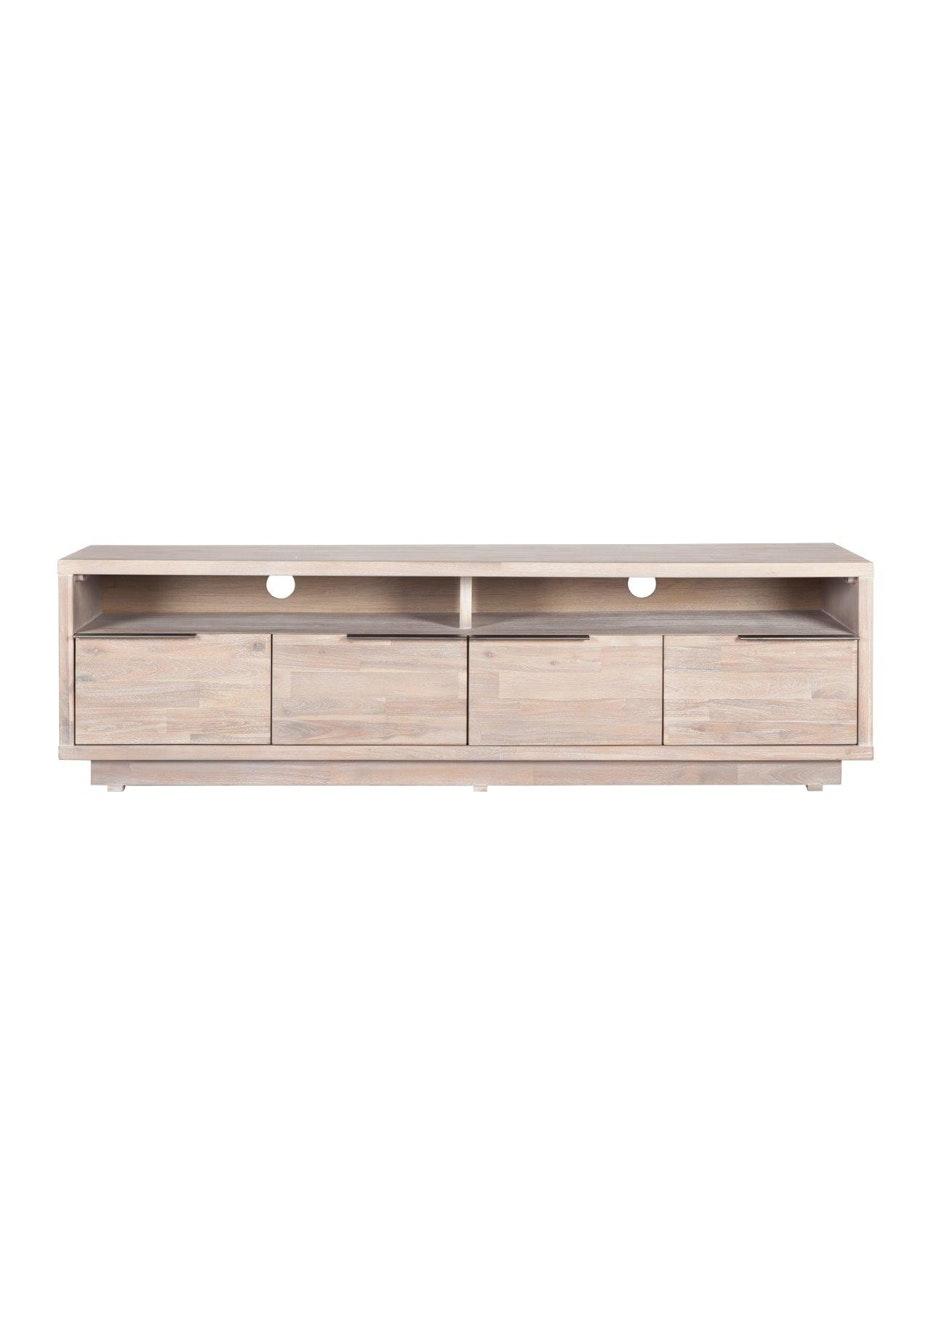 Furniture By Design - Soli 2drawer Media Centre